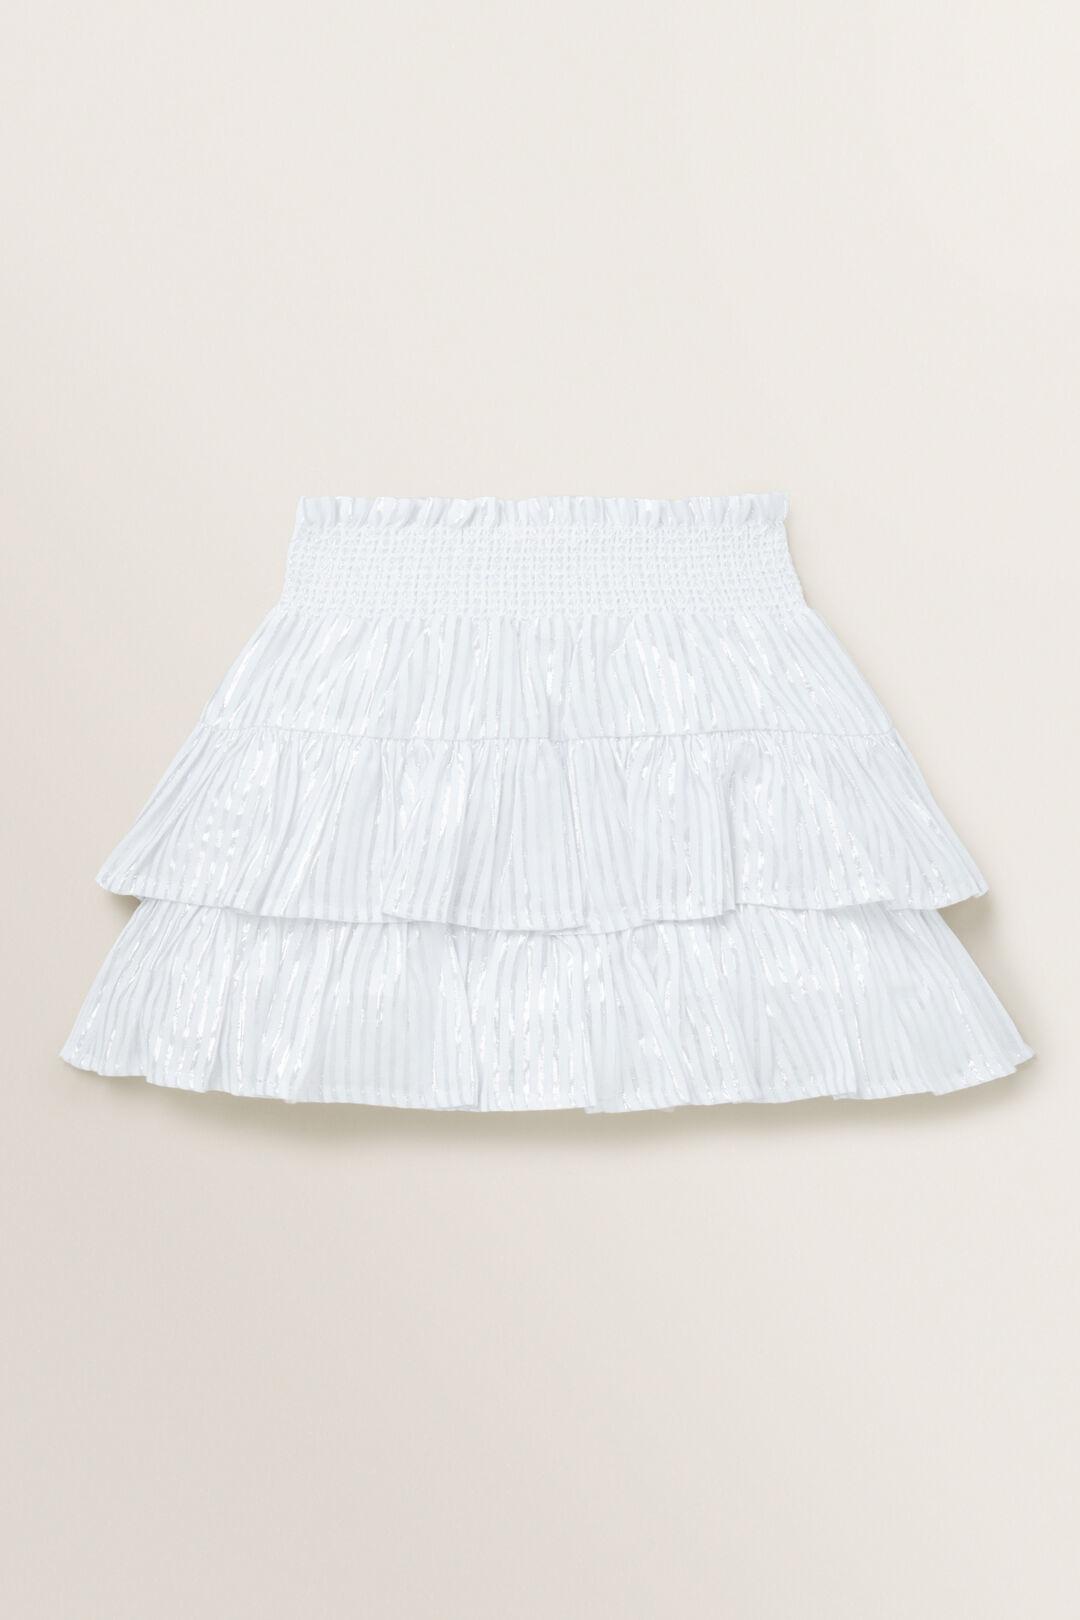 Metallic Skirt  WHITE/SILVER  hi-res